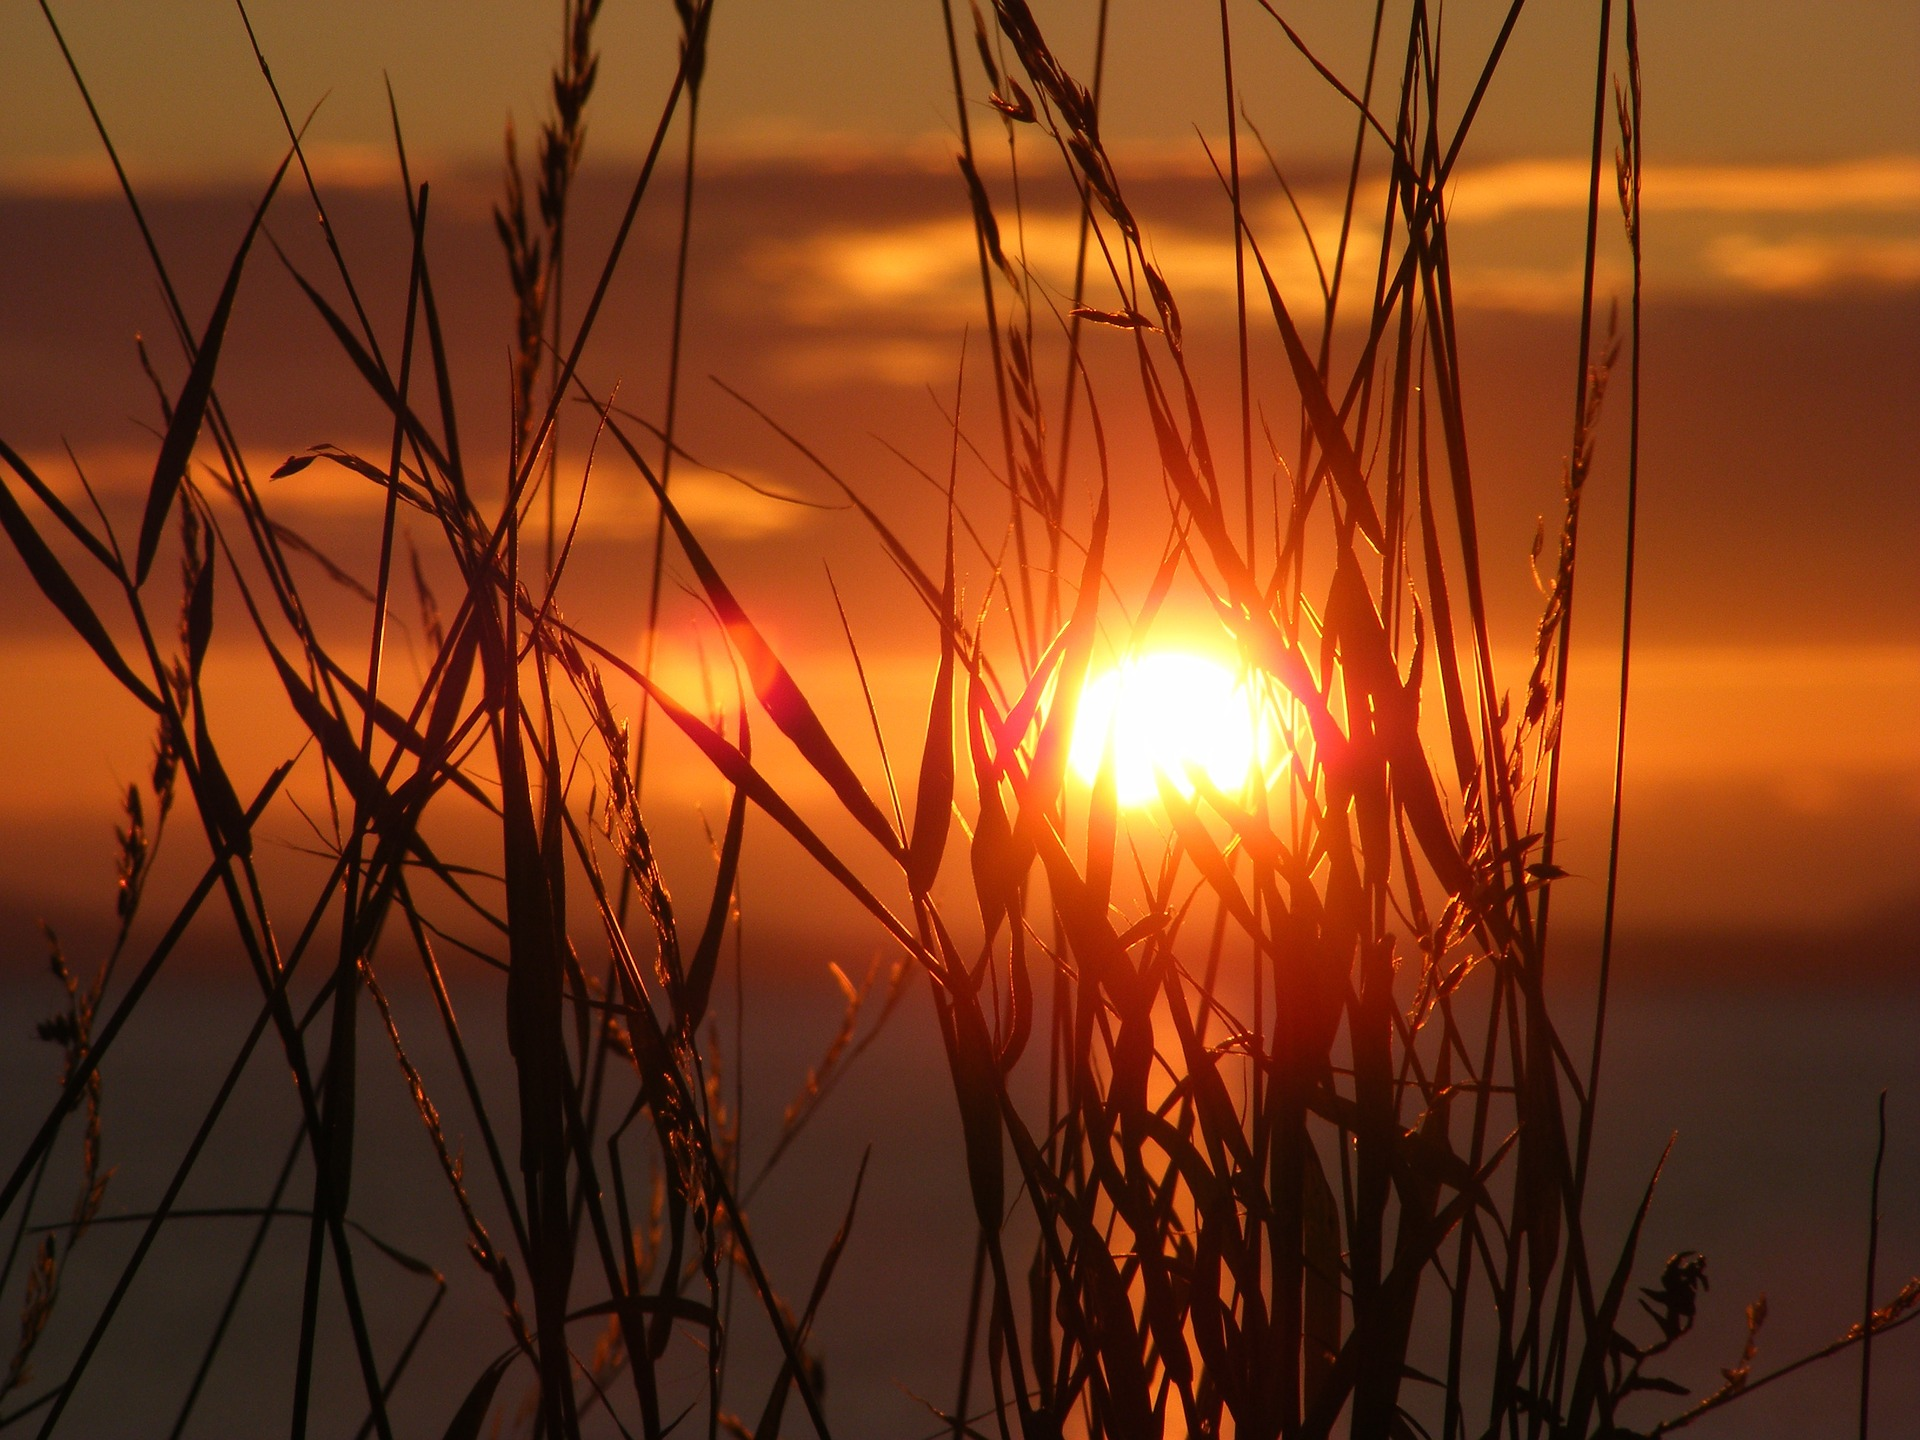 sunset-657148_1920